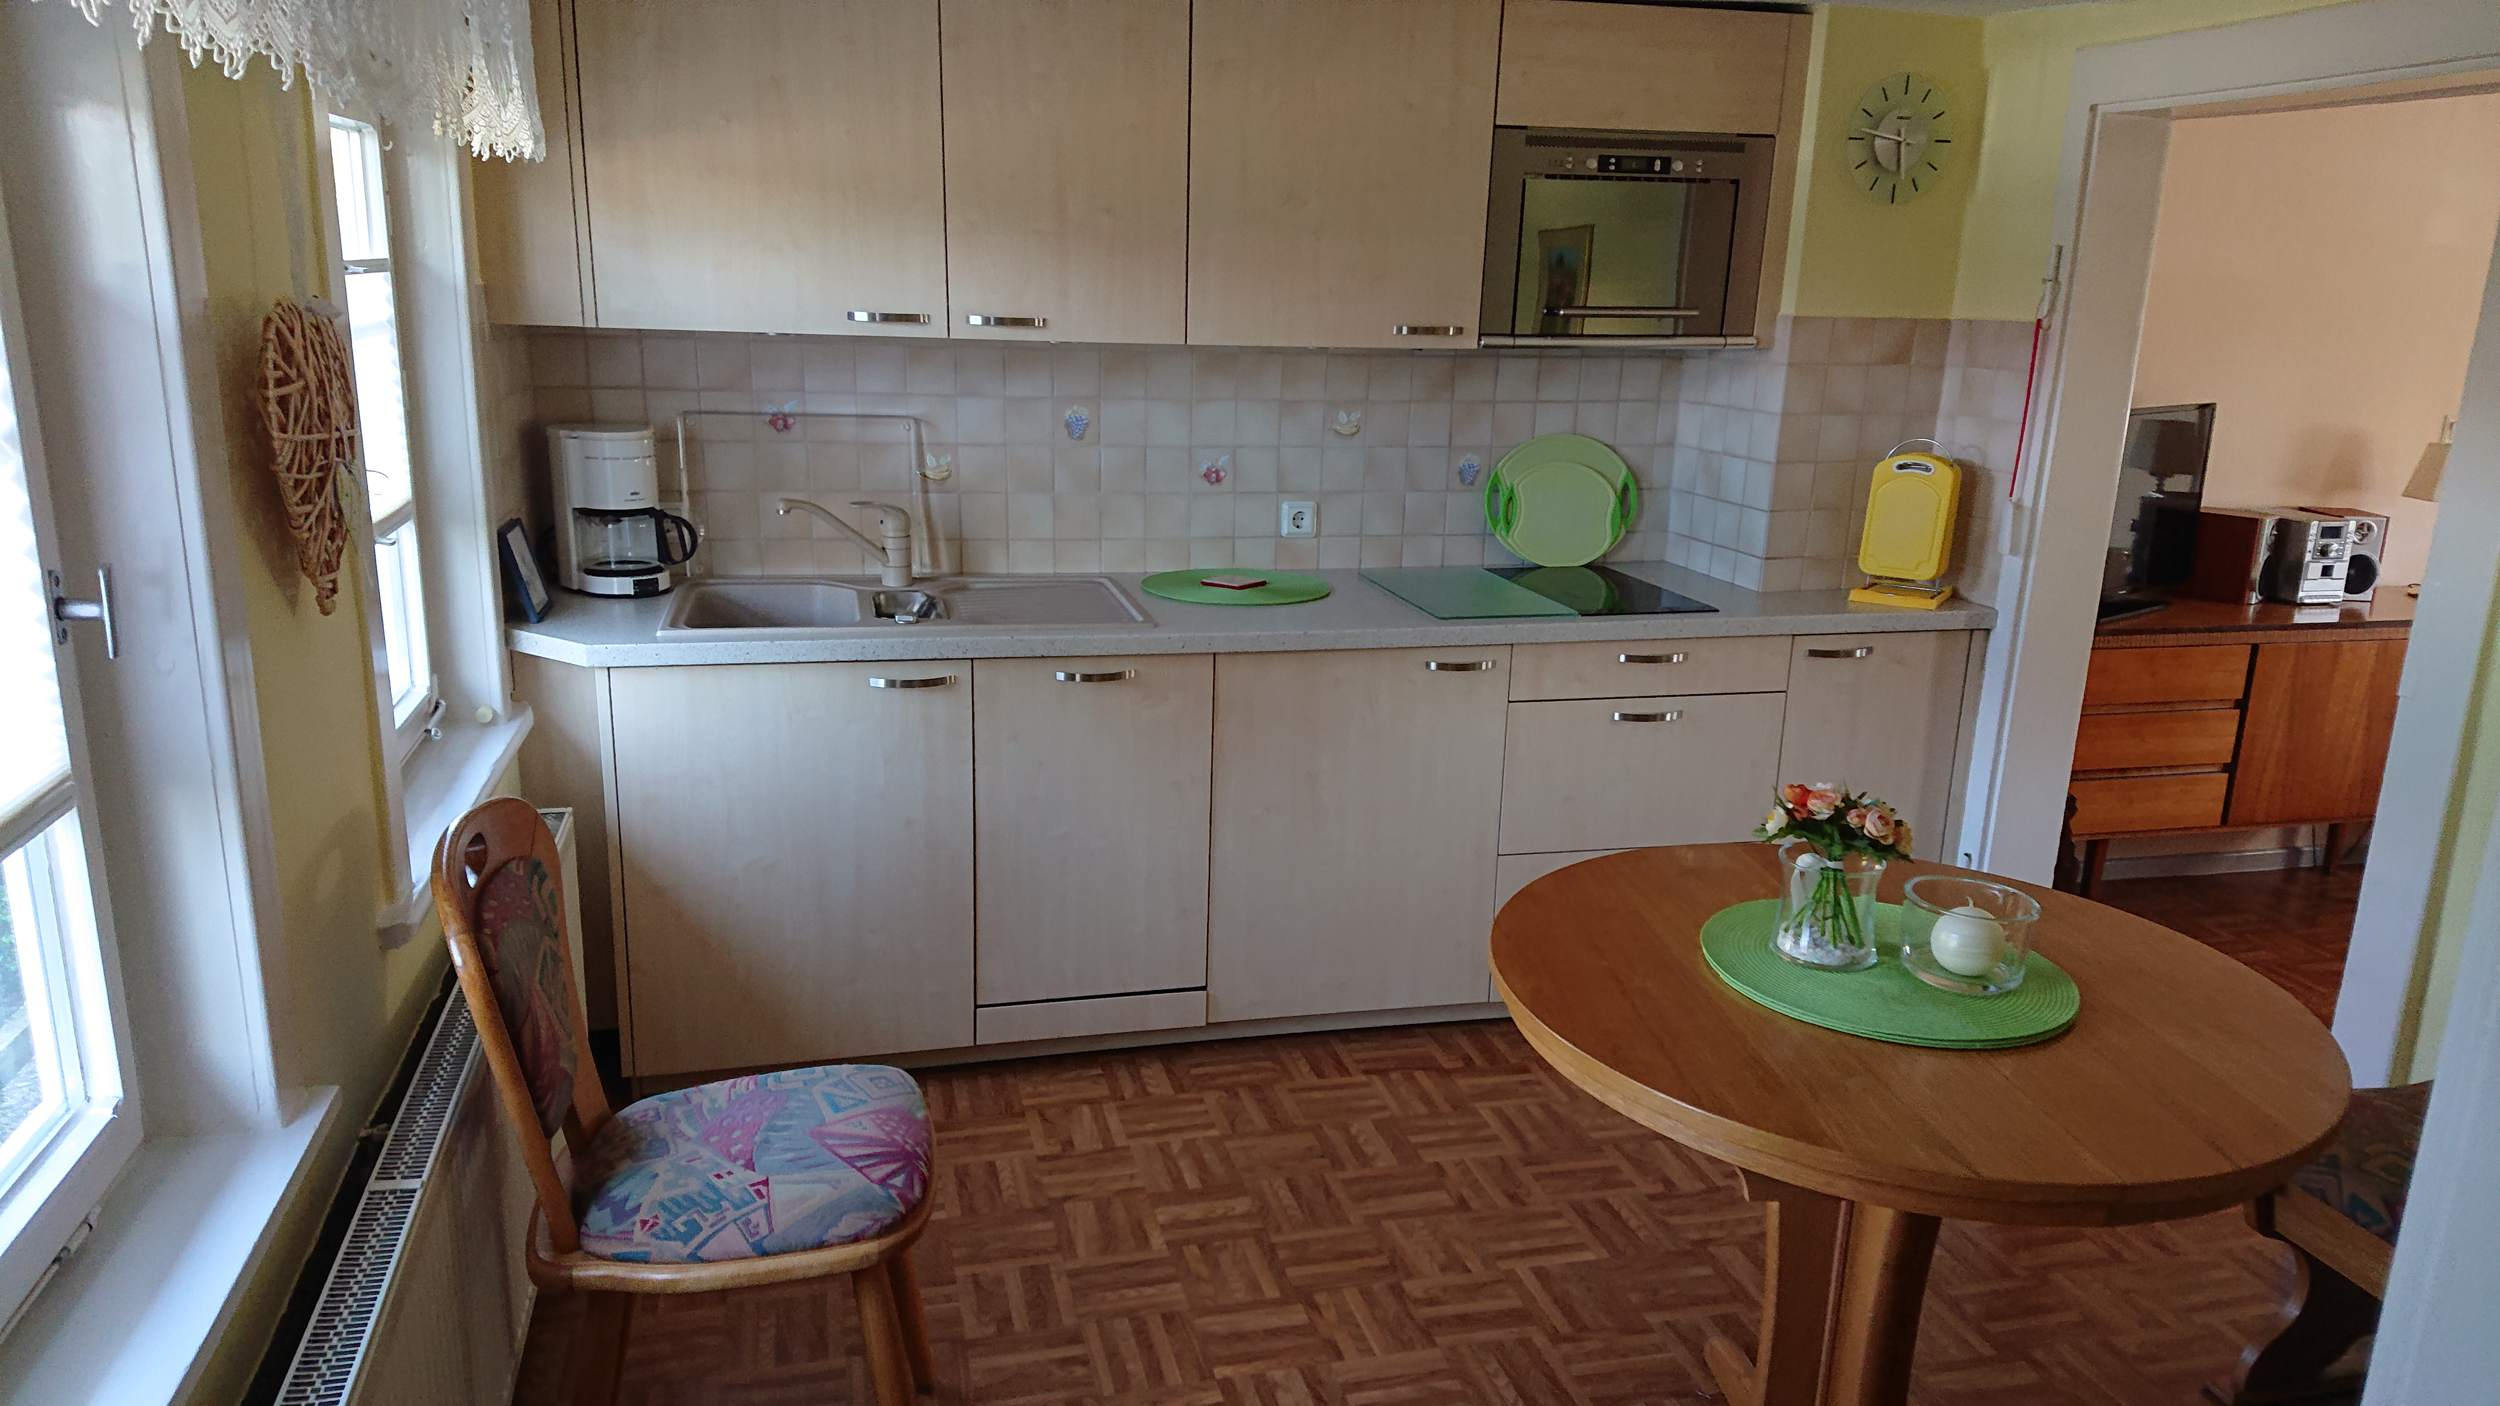 Ferienhaus Breiler in Astfeld - Küche